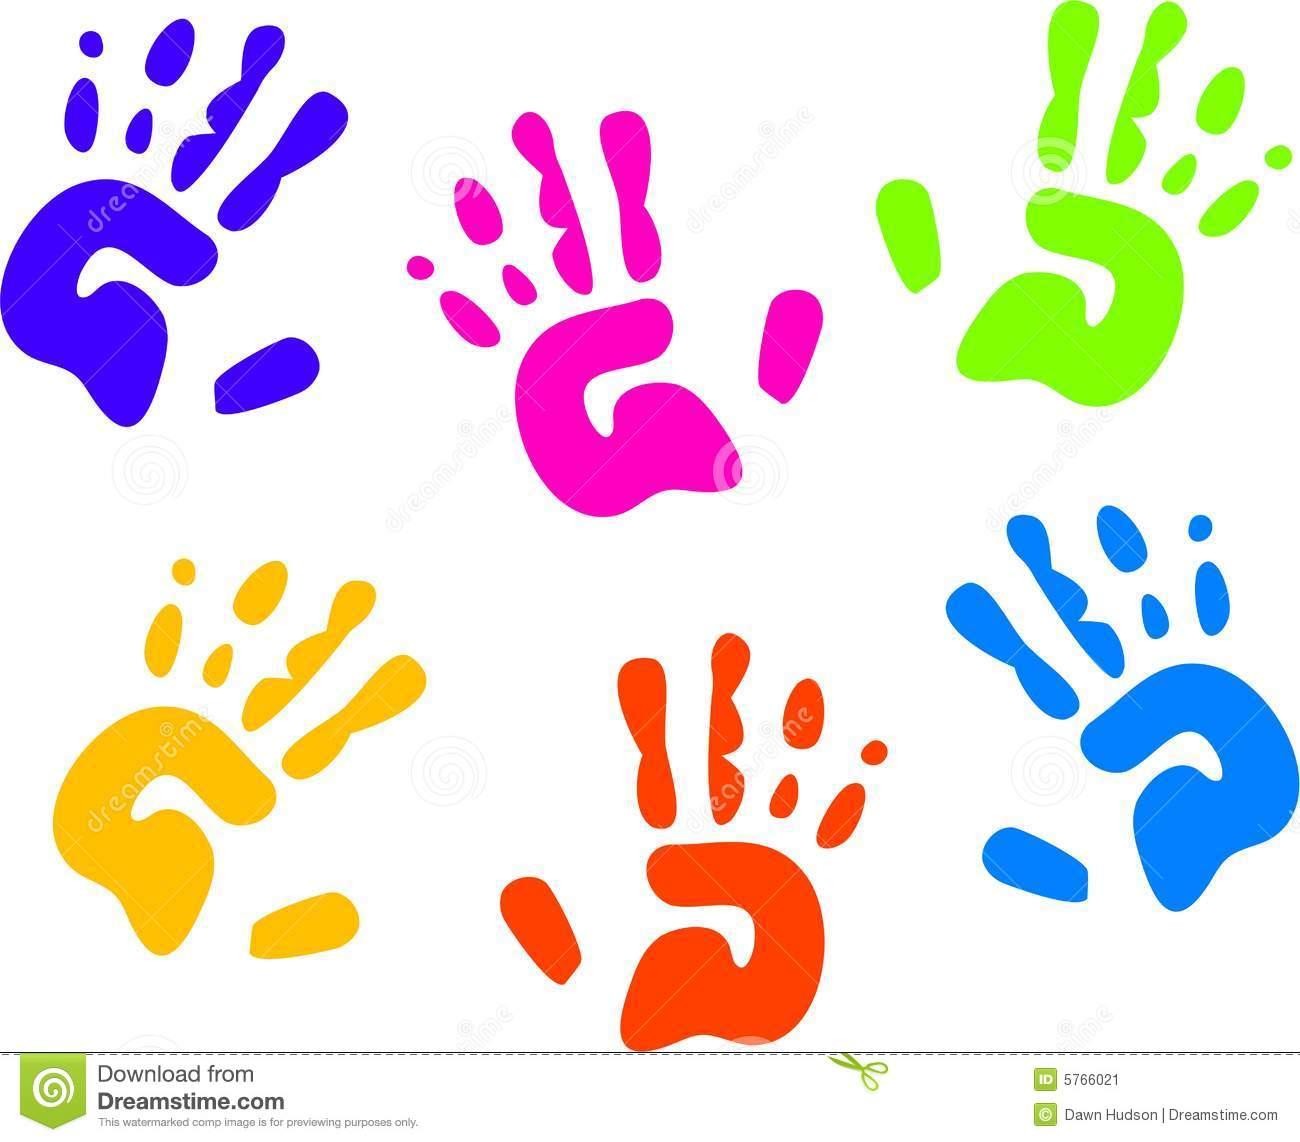 Kids hands clipart transparent Child Hands Clipart | Clipart Panda - Free Clipart Images transparent